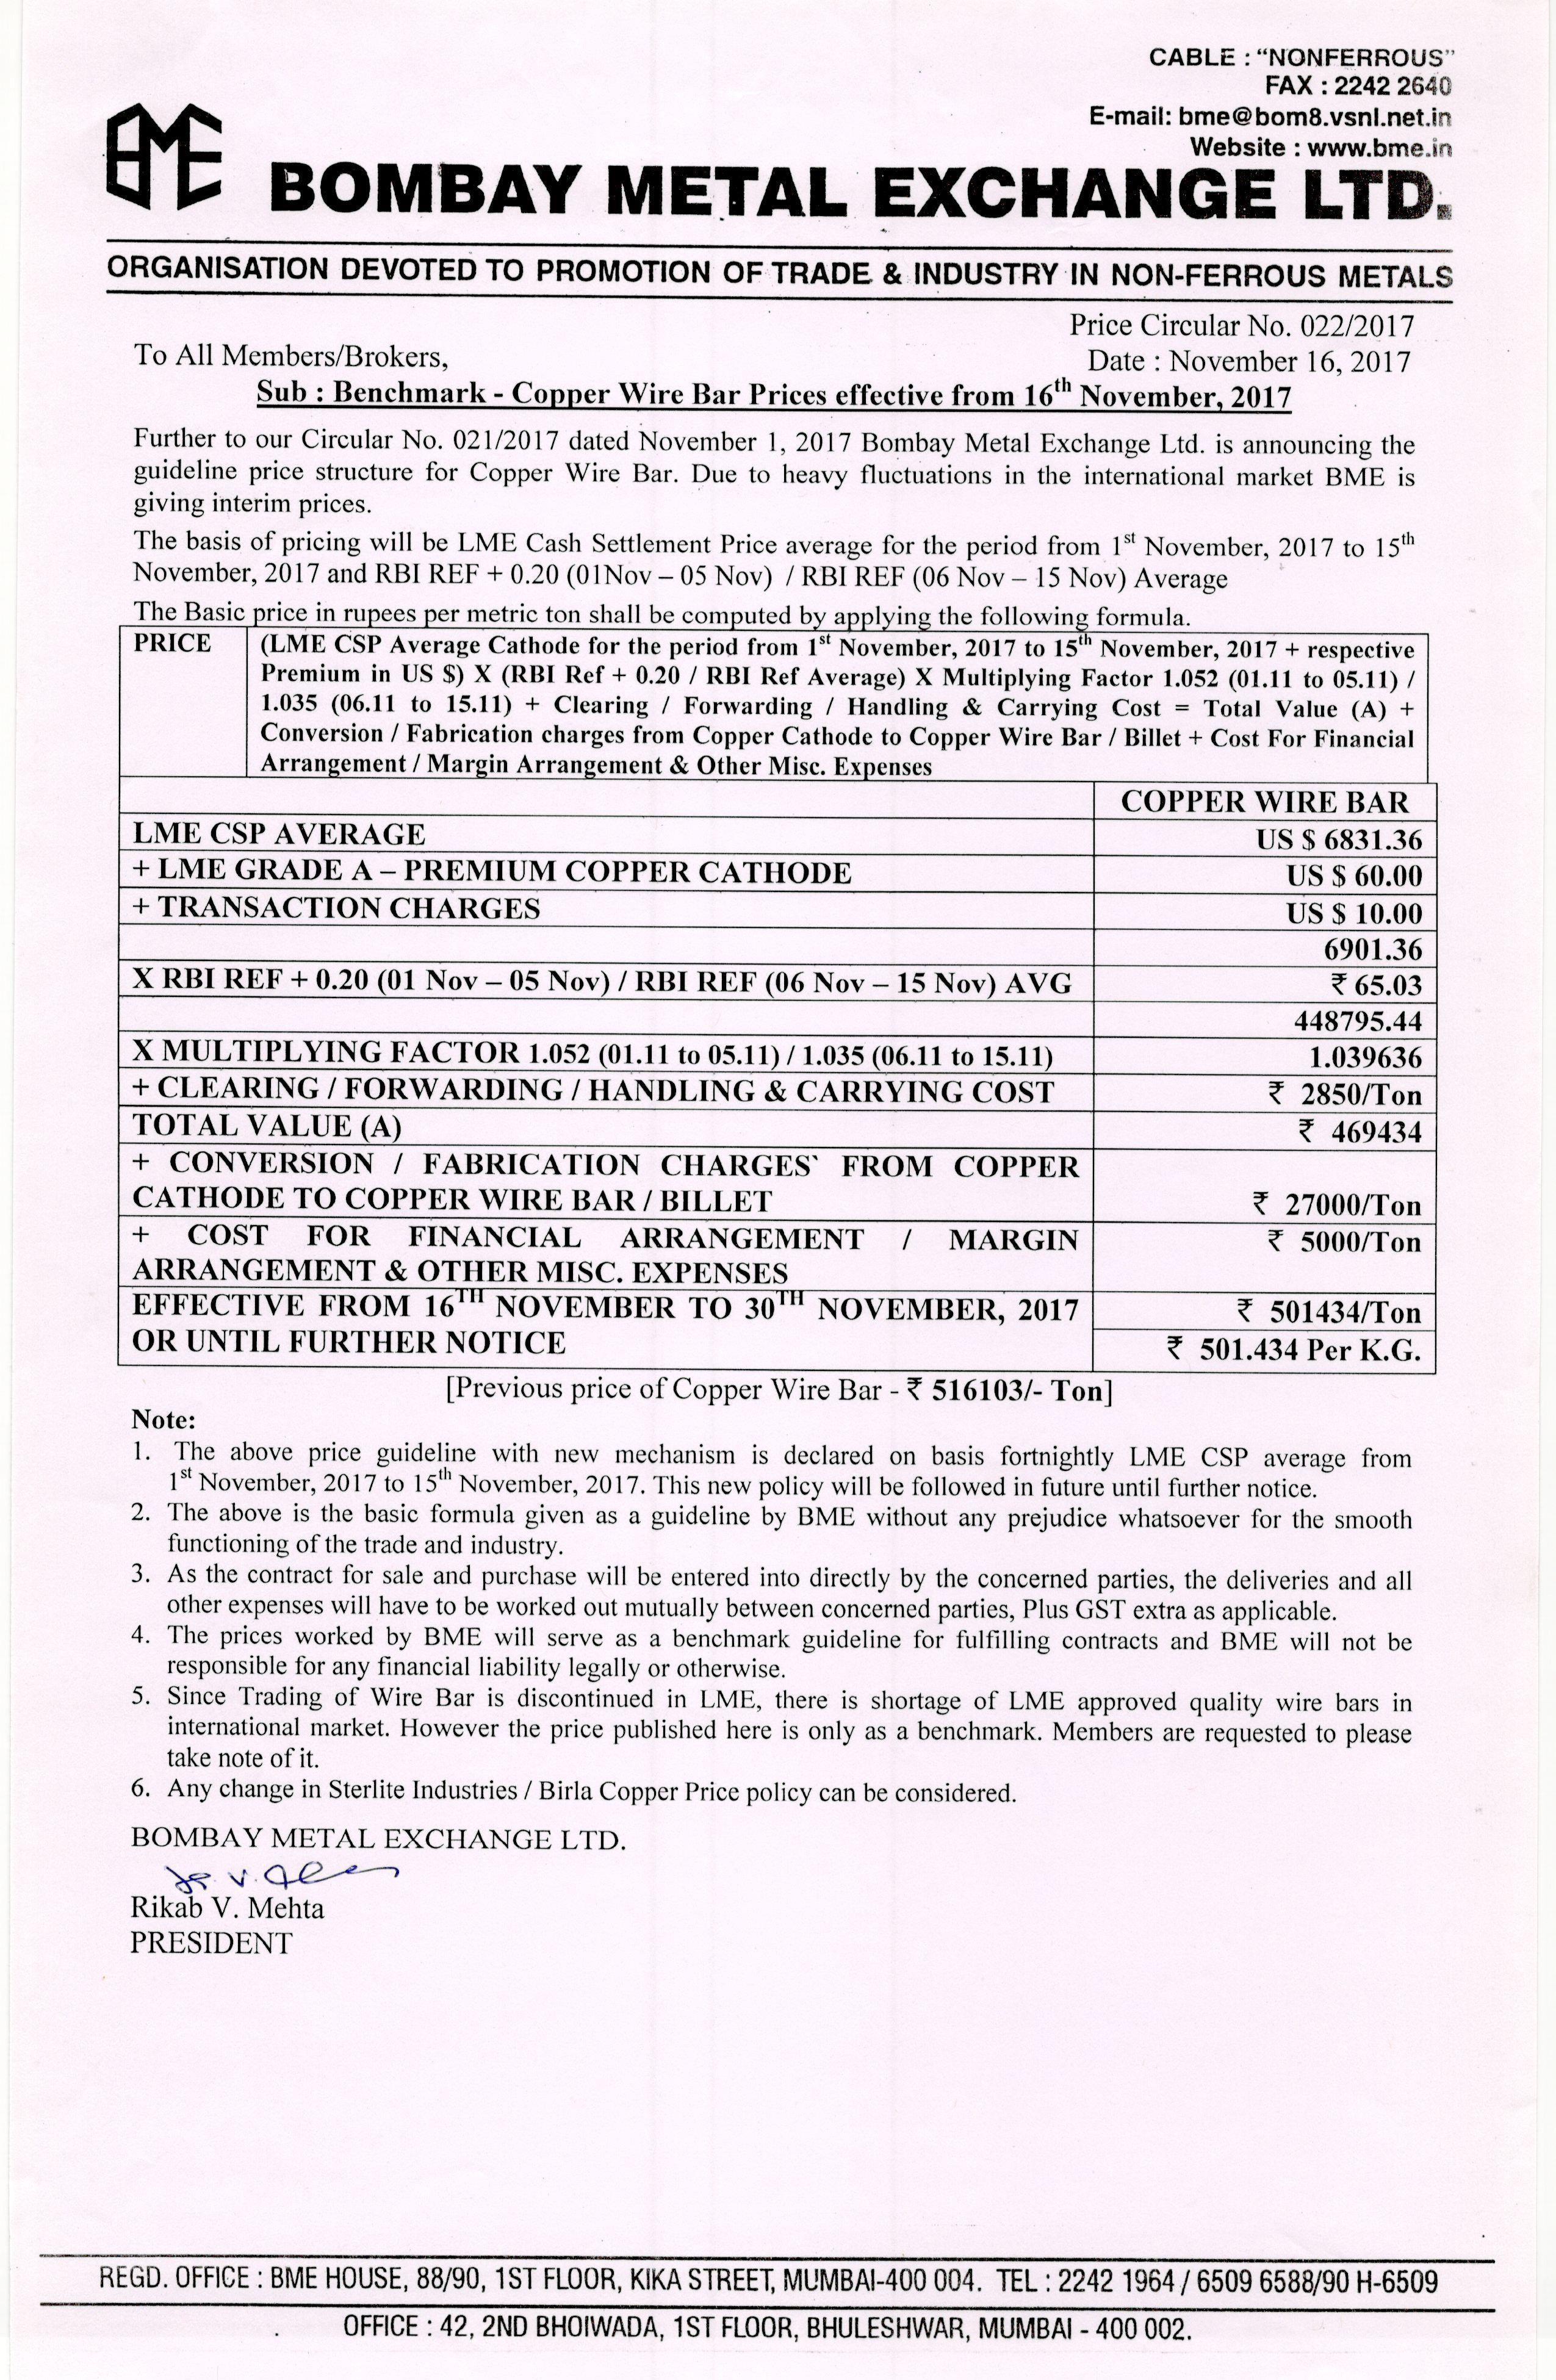 Bombay Metal Exchange Ltd.